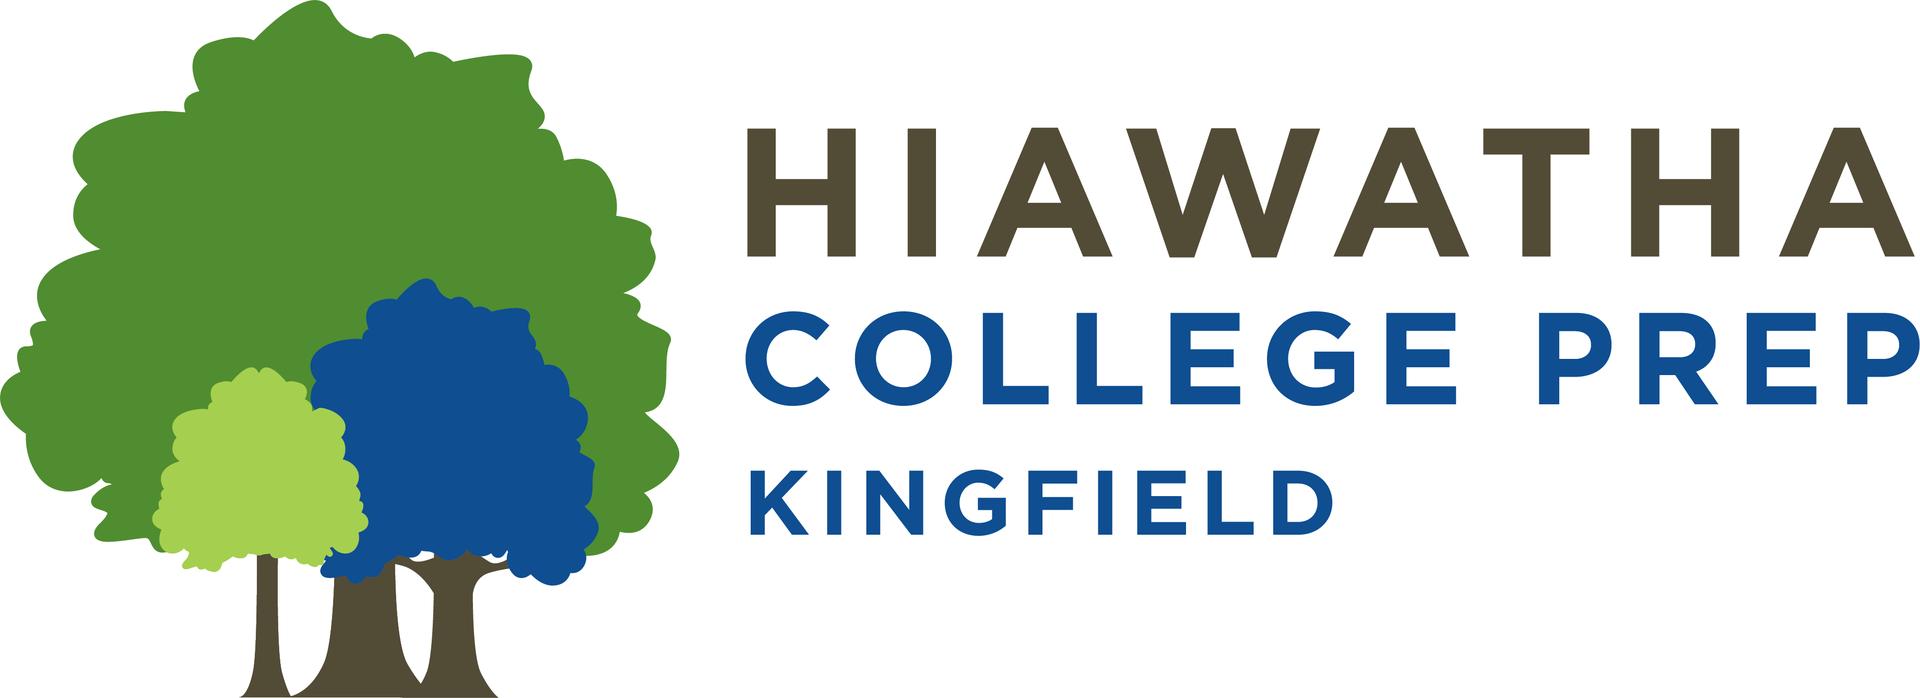 Hiawatha College Prep - Kingfield